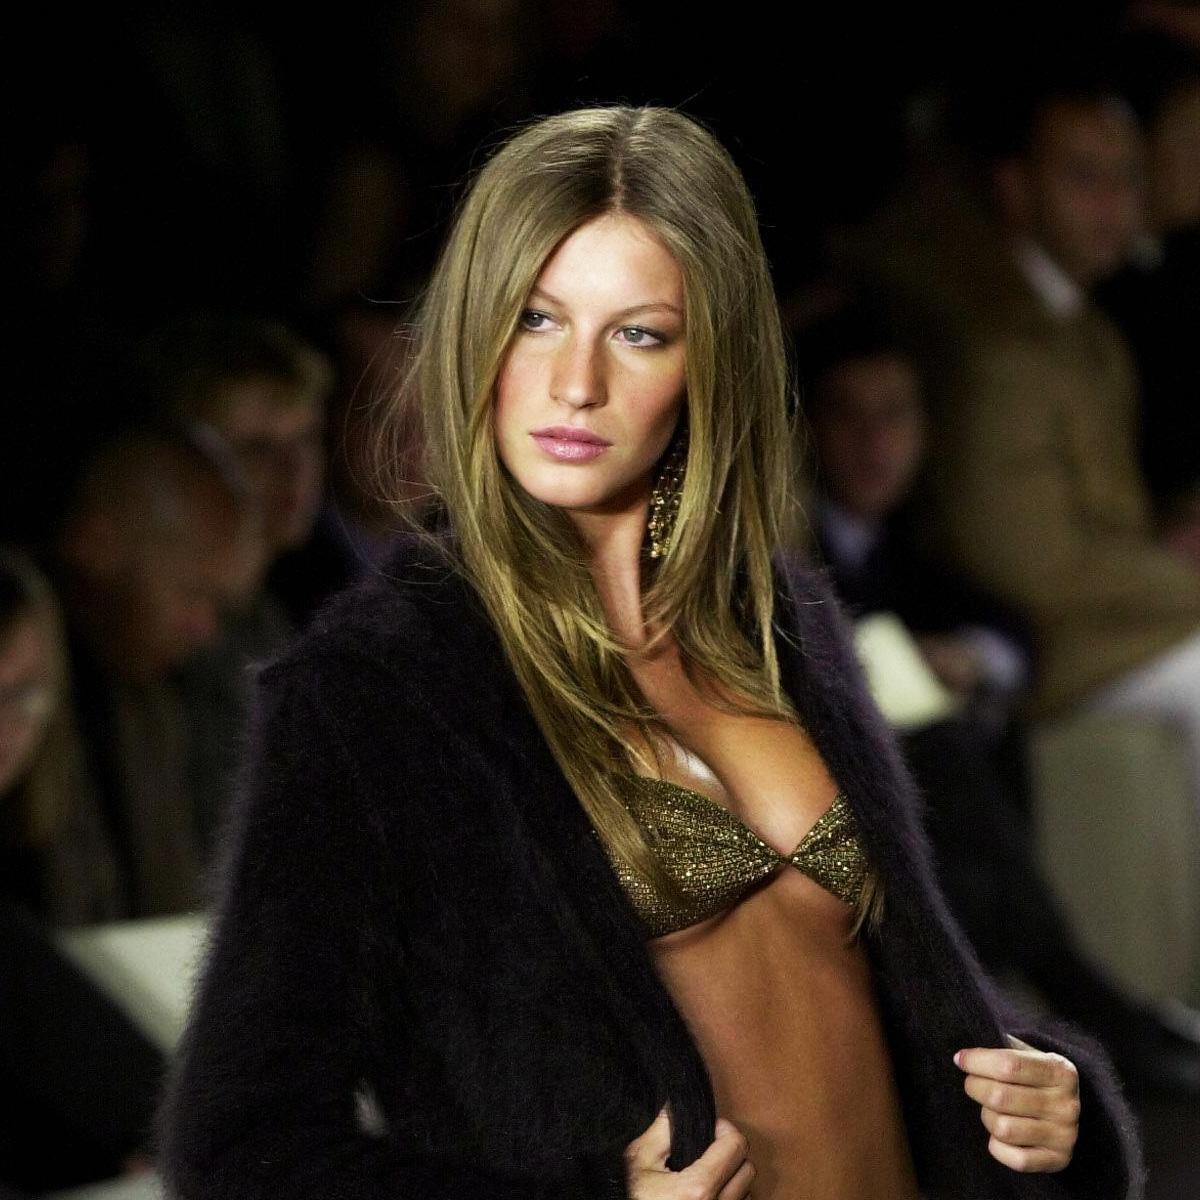 Gisele, Fashion Week, NYFW, 2000, Ralph Lauren, Gisele Bündchen